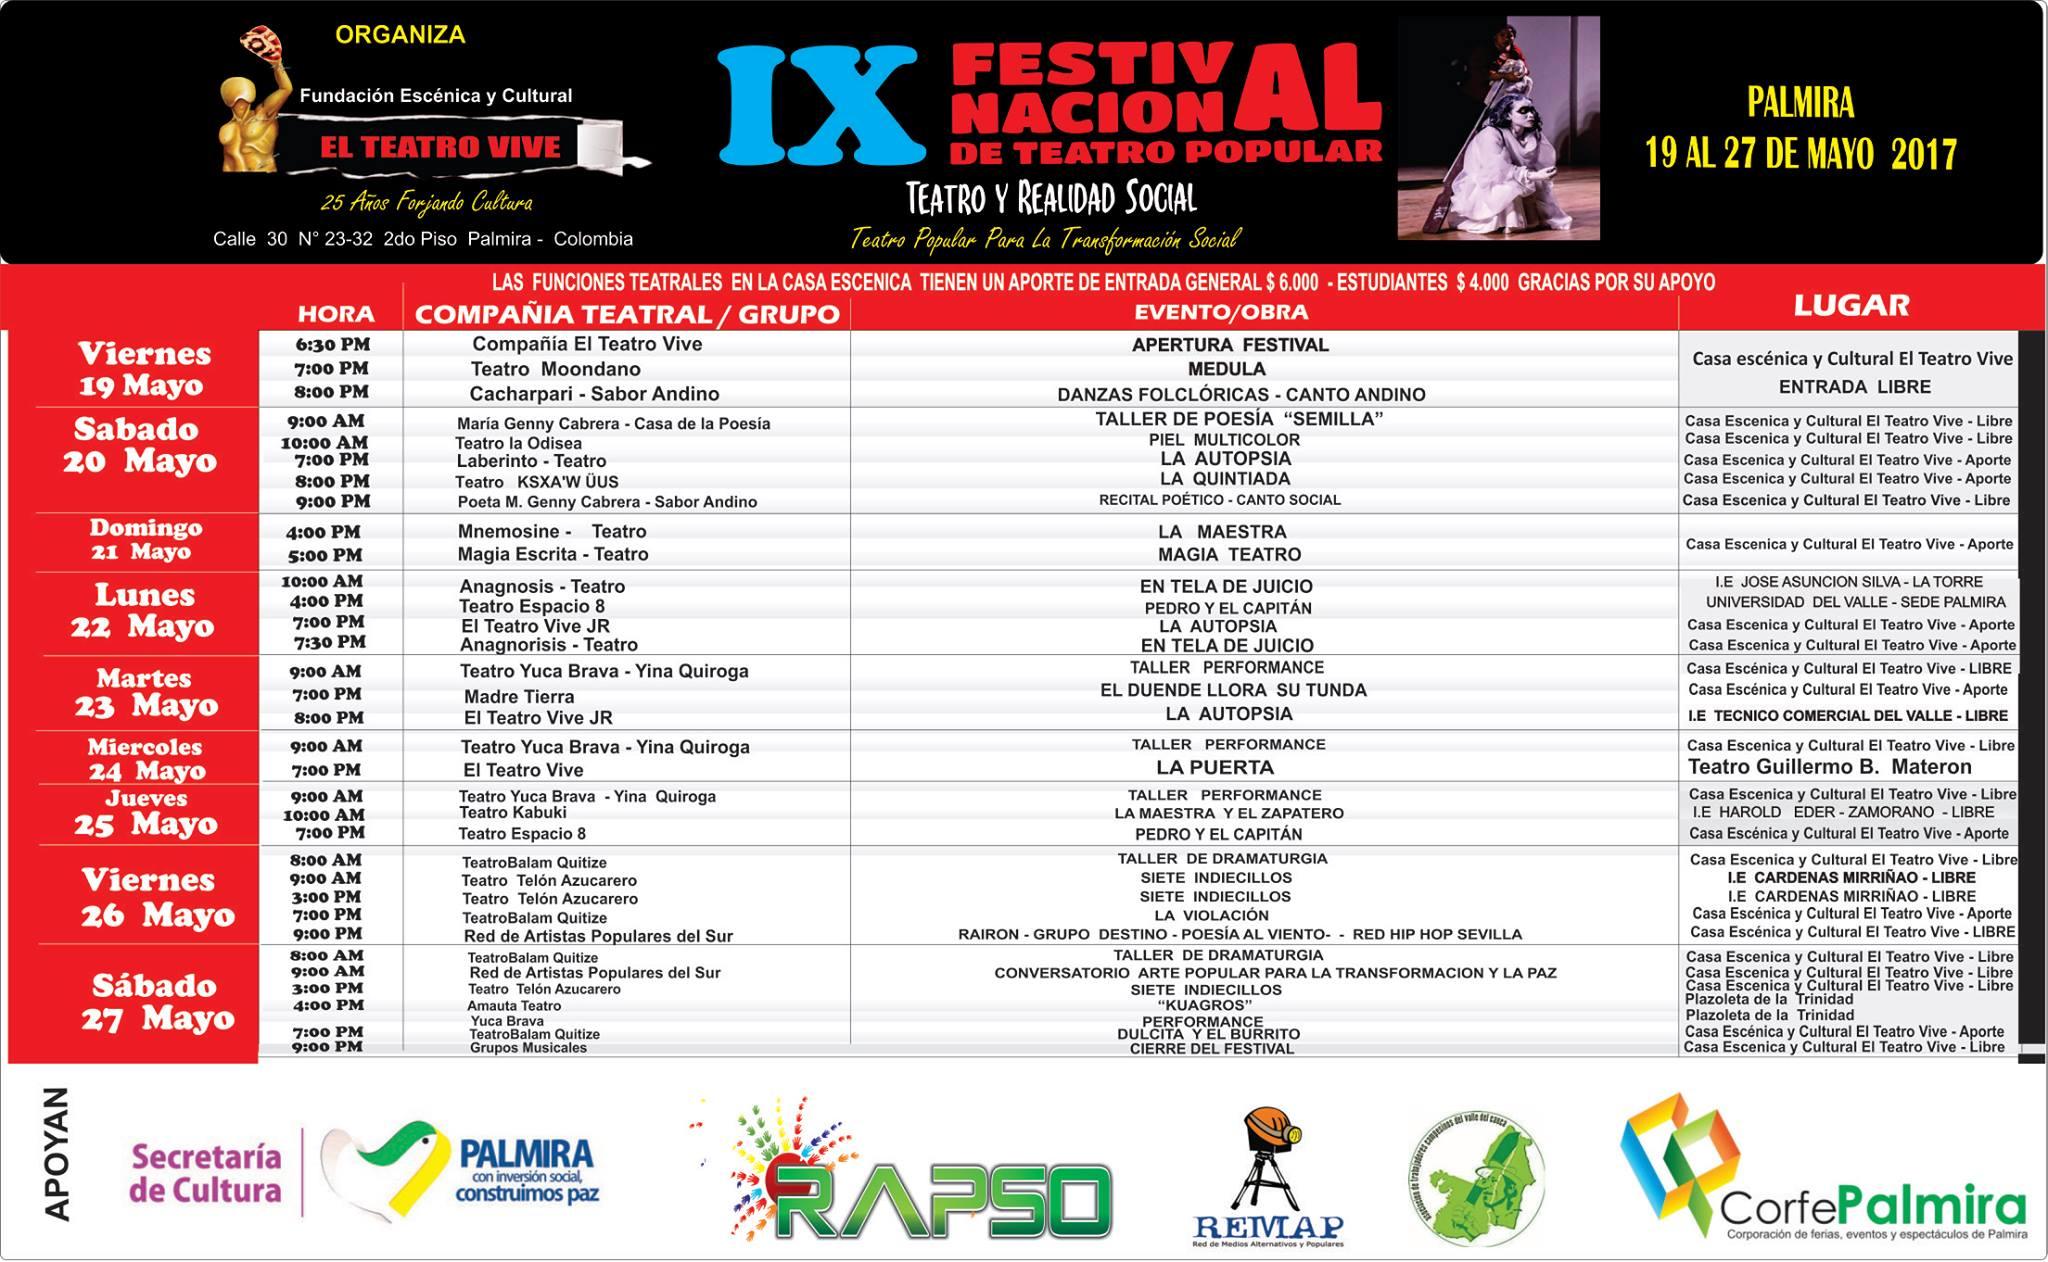 Programacion IX Festival Nacional de Teatro Popular